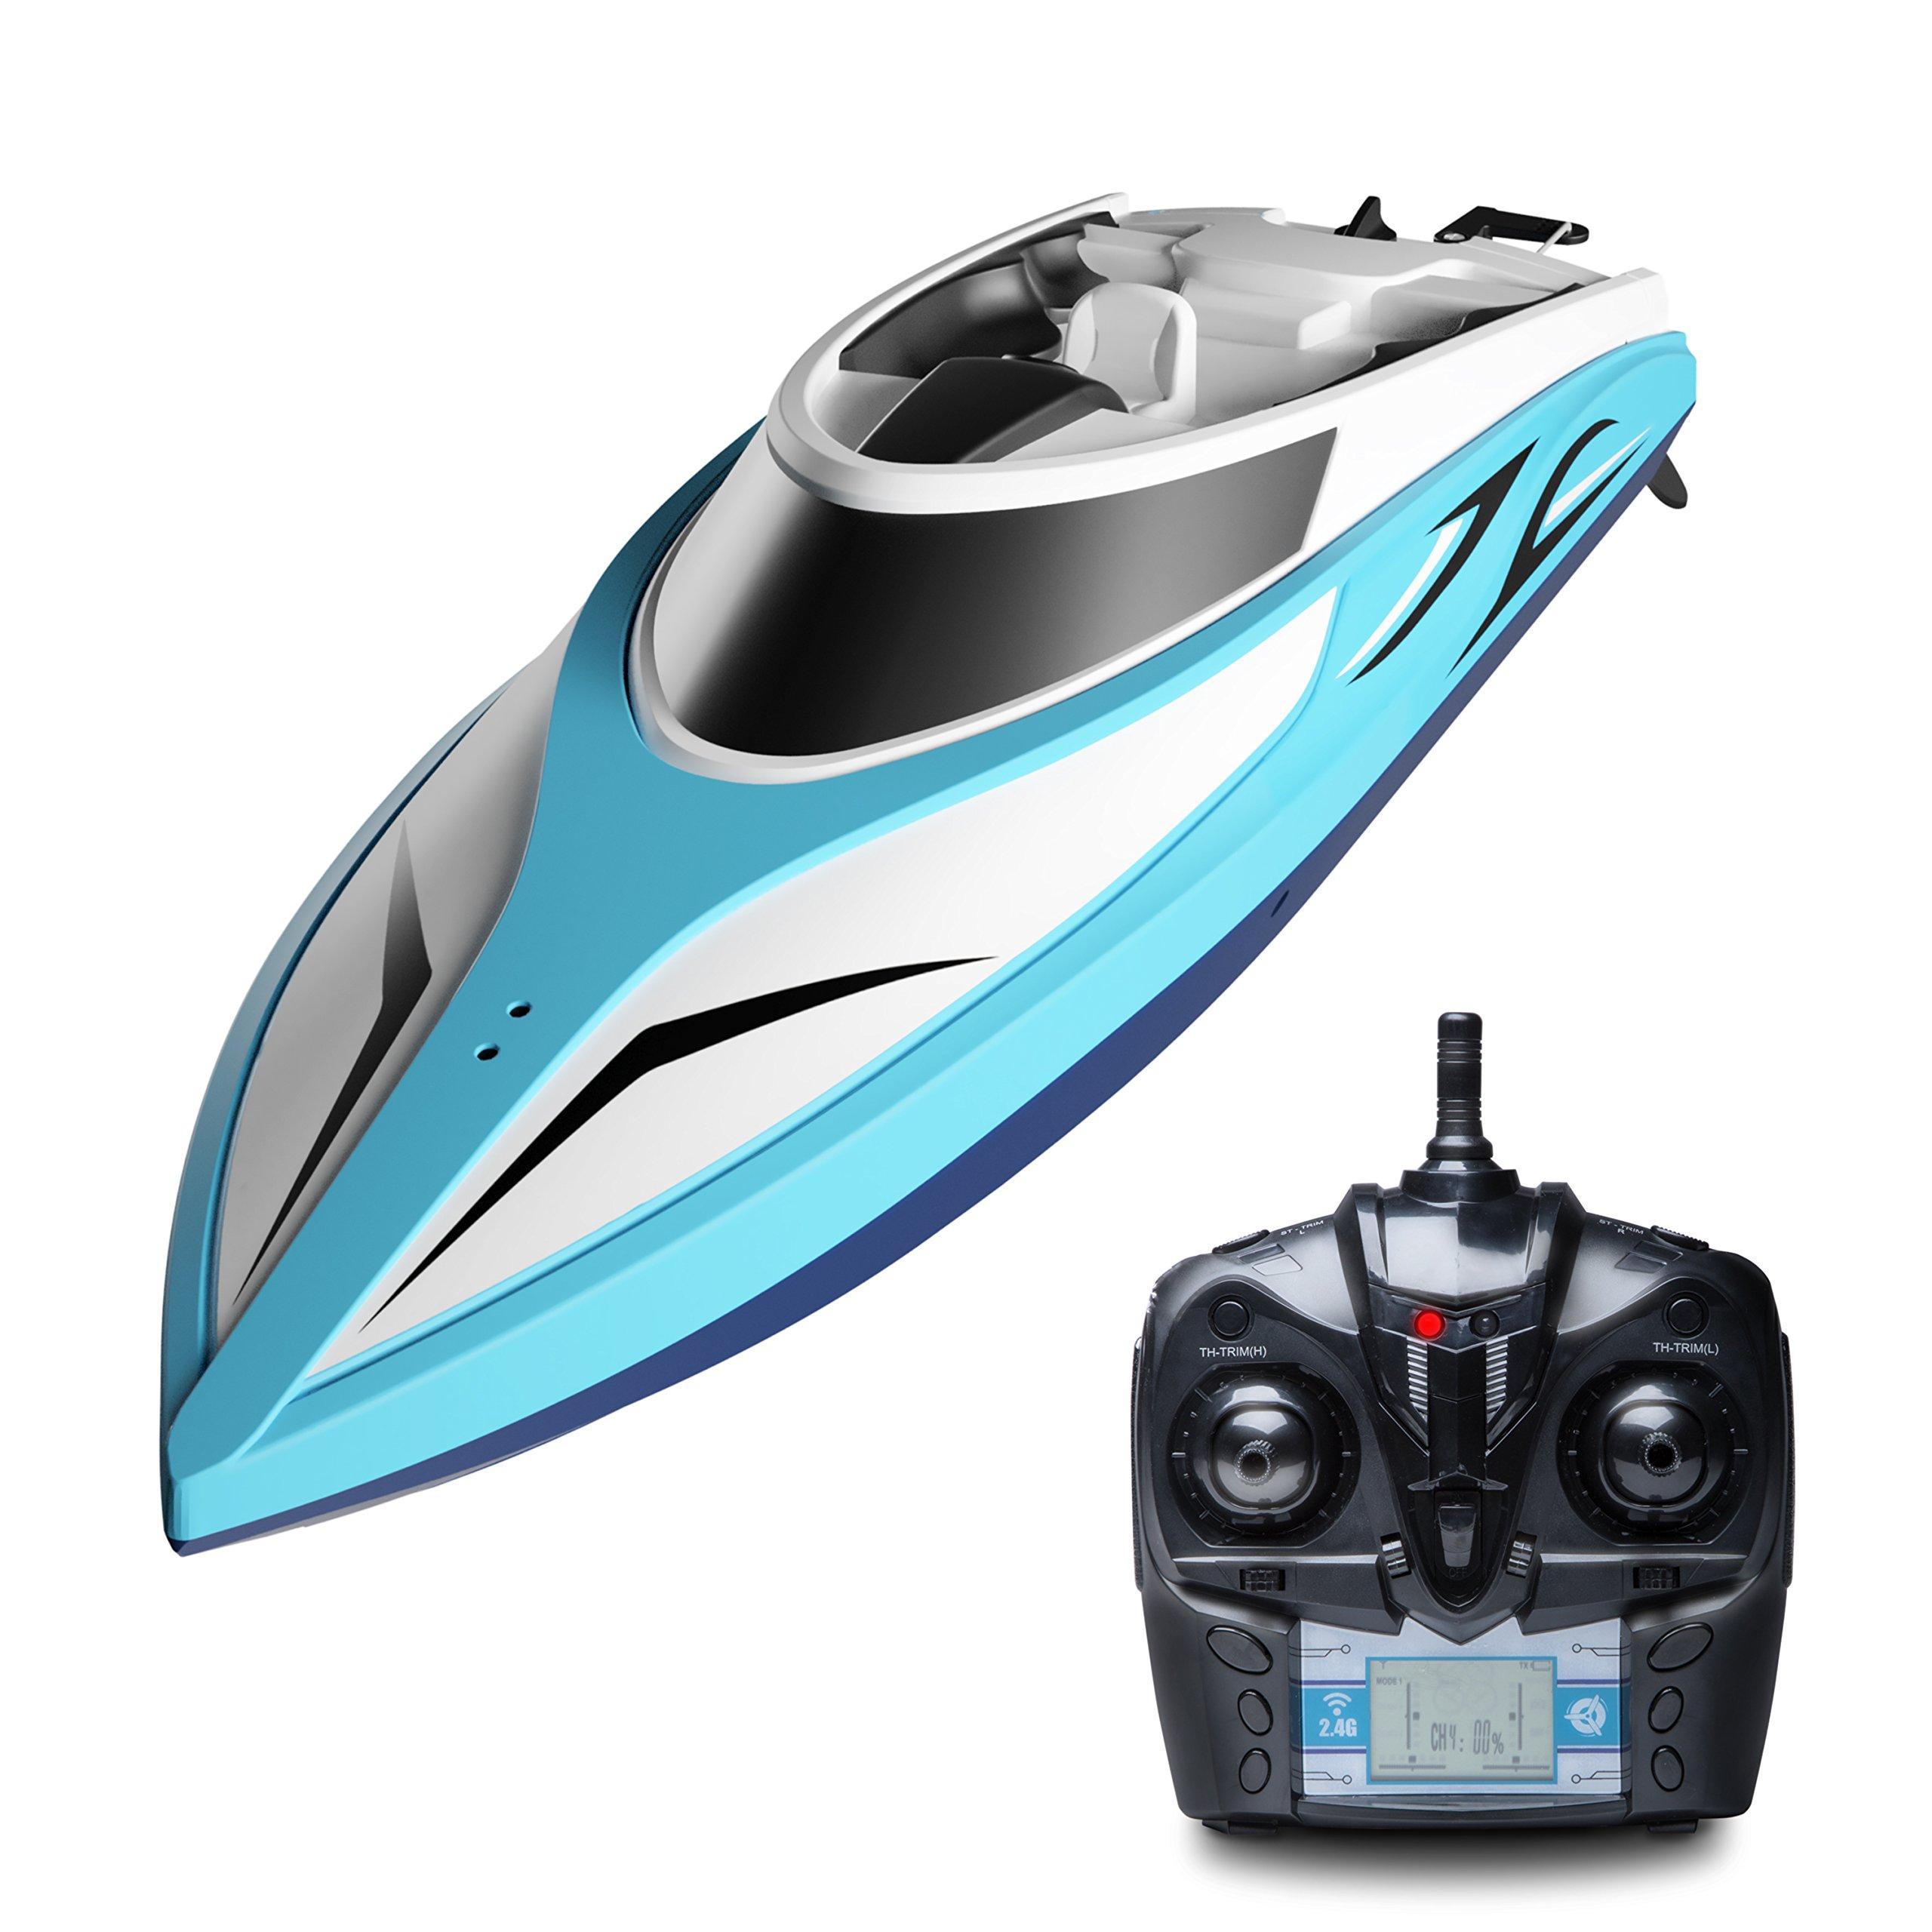 Buy Velocity Remote Control Boat Now!